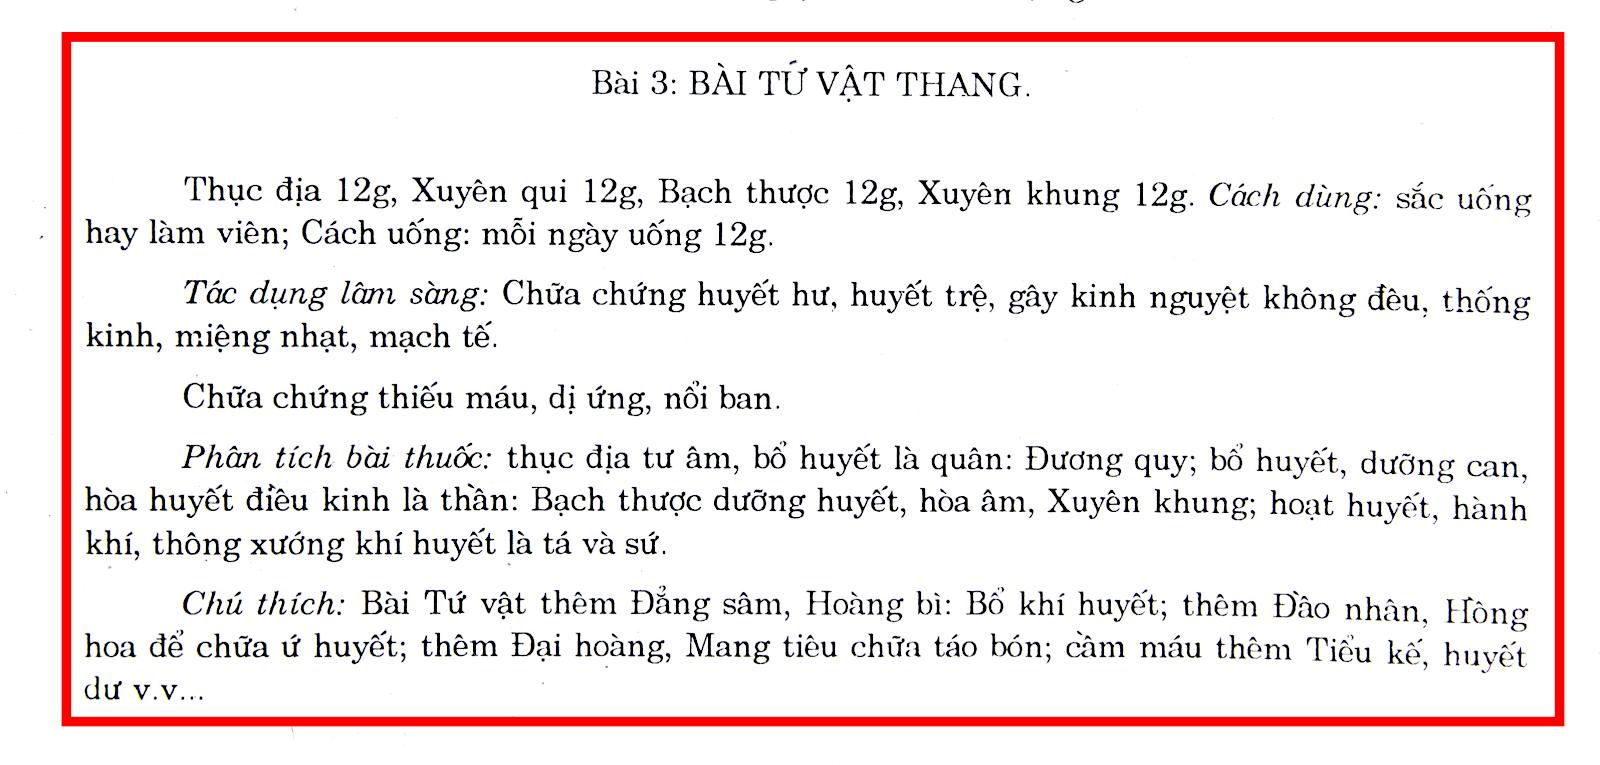 bai-thuoc-tu-vat-thang-y-hoc-co-truyen-ok